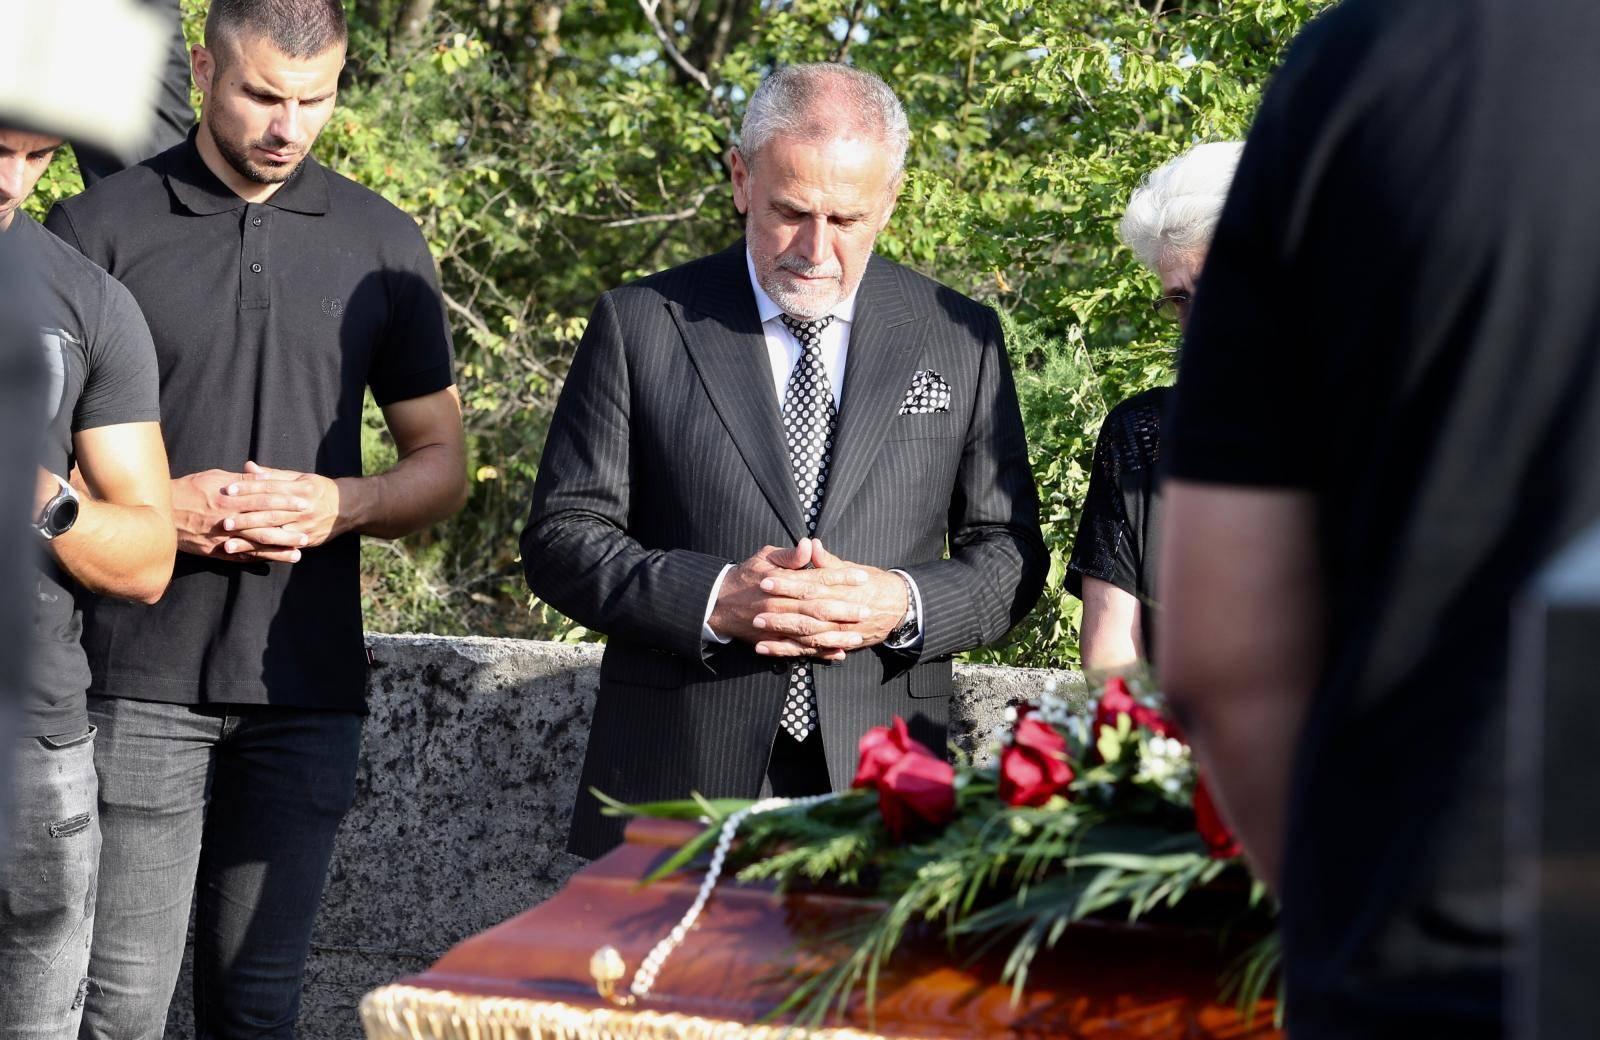 Grude: Sprovod Blagice Bandić, majke gradonacelnika Zagreba Milana Bandića